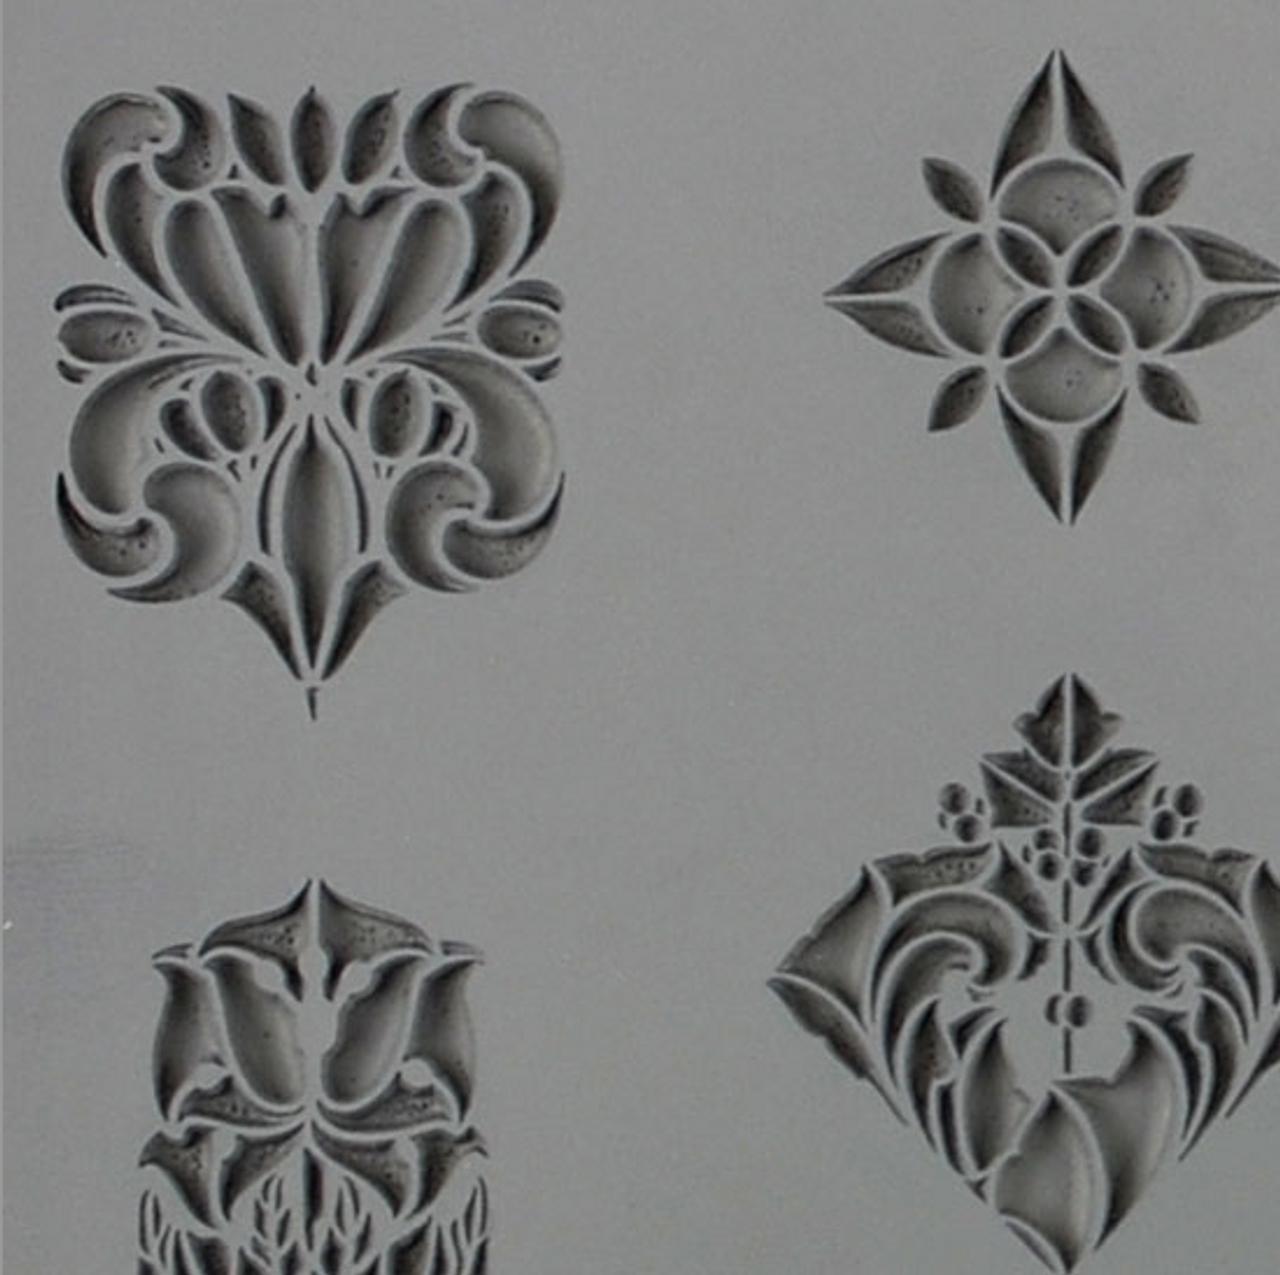 Jewellery Artist Elements Texture Sheet - Arts & Crafts - Elements